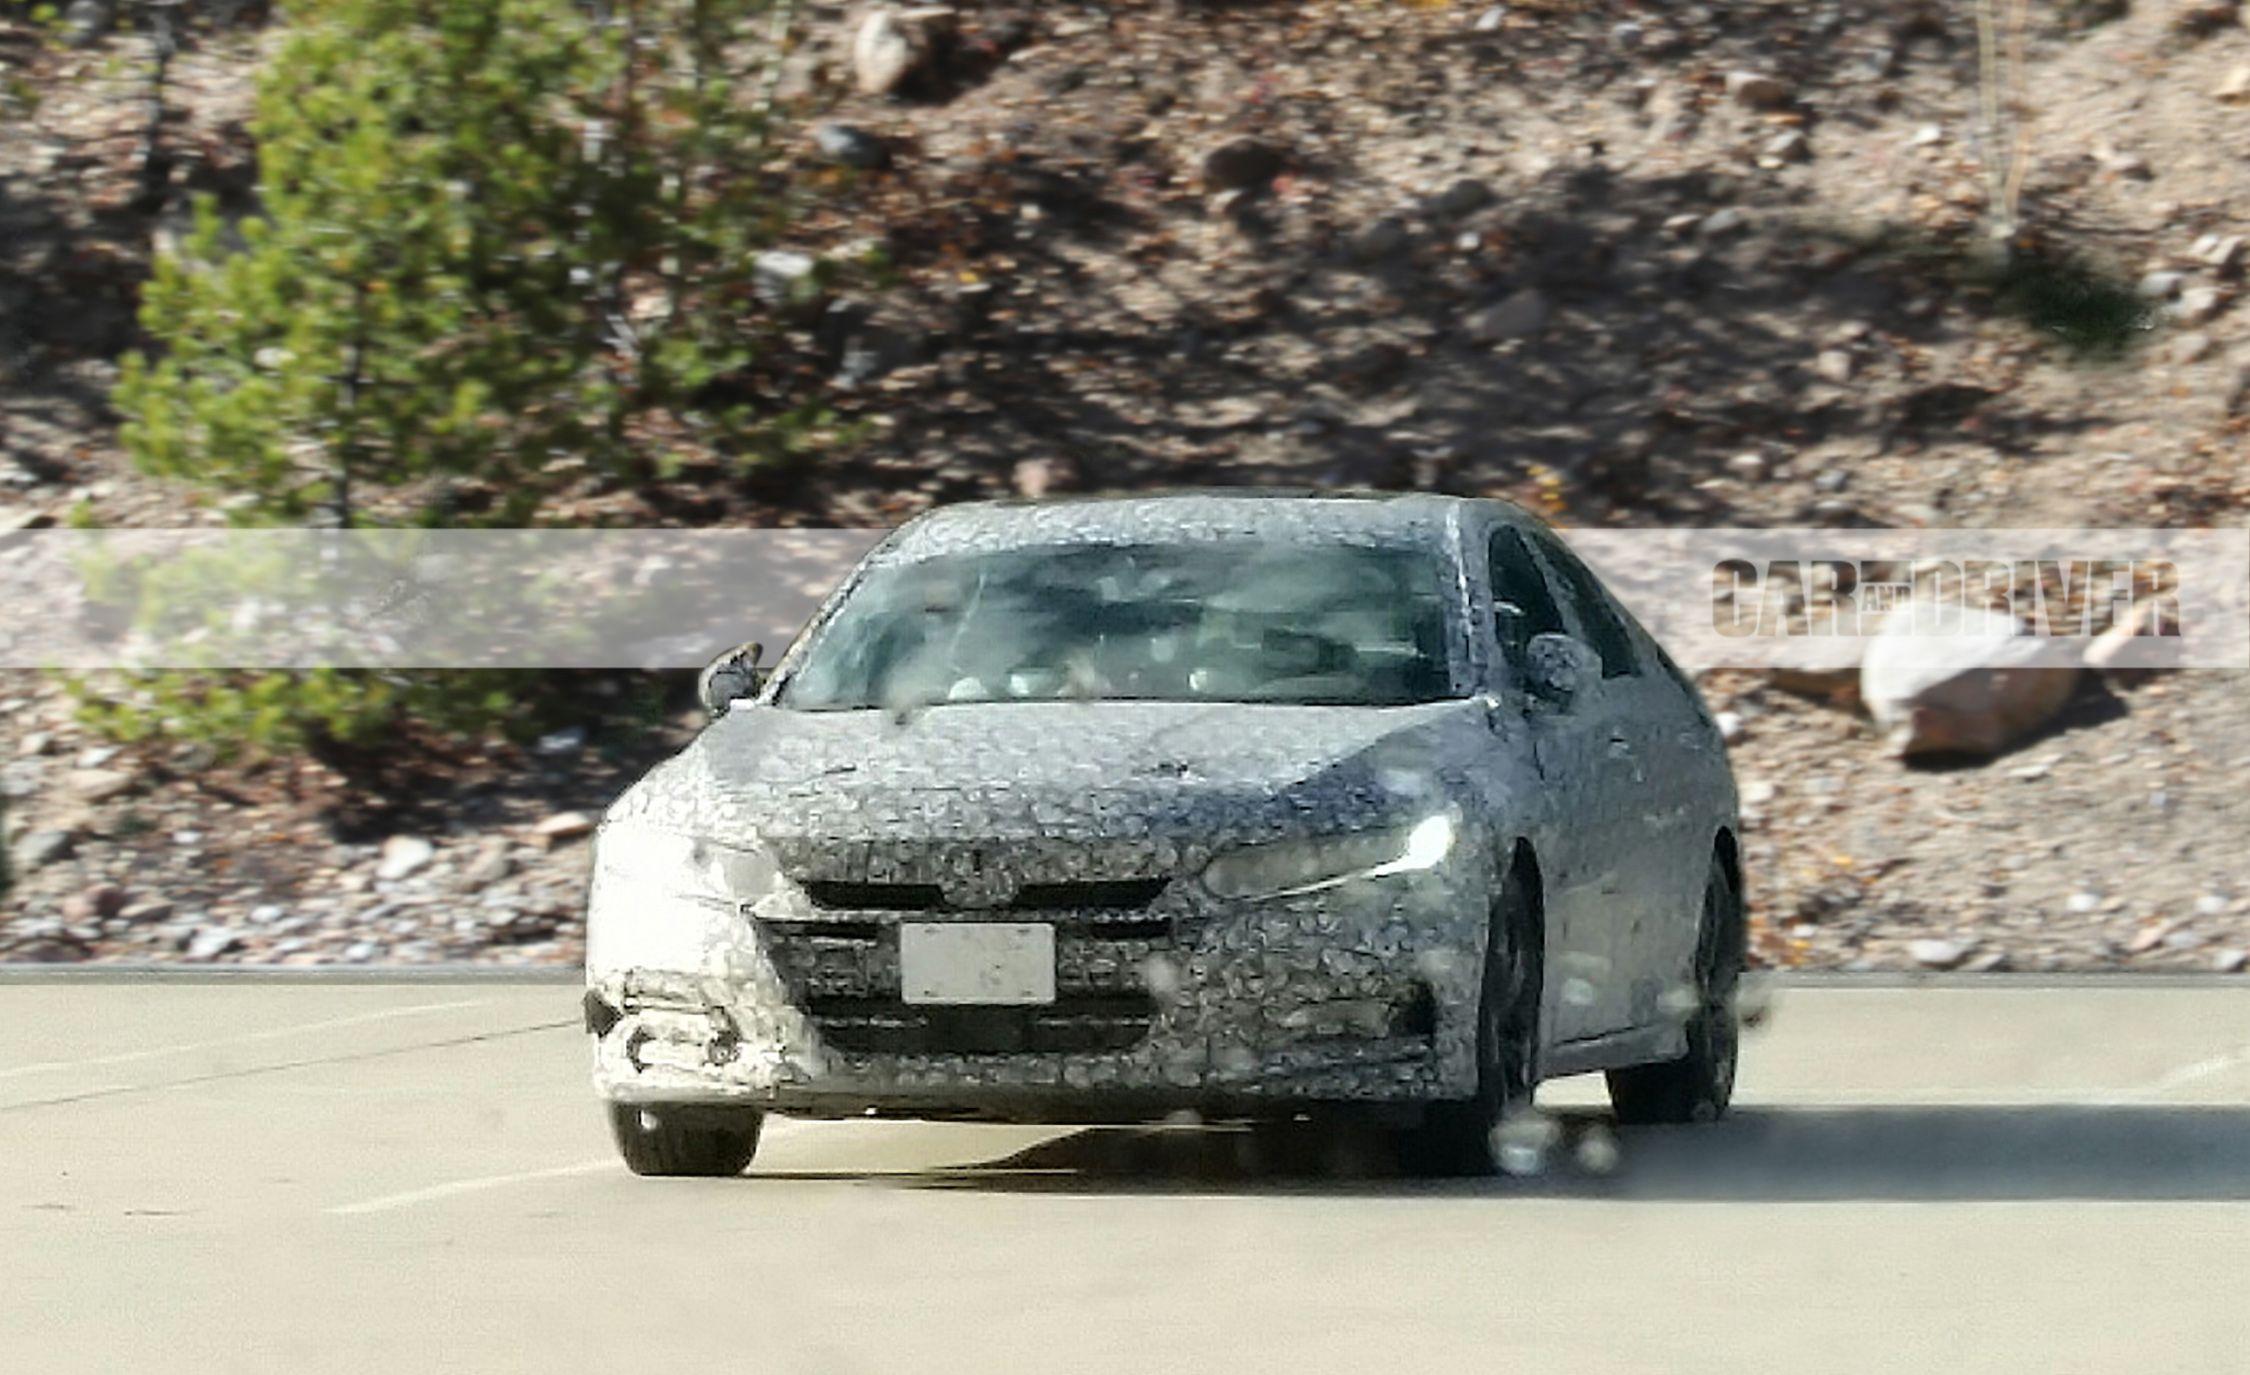 2018 Honda Accord (spy photo) - Photo Gallery | Car and Driver